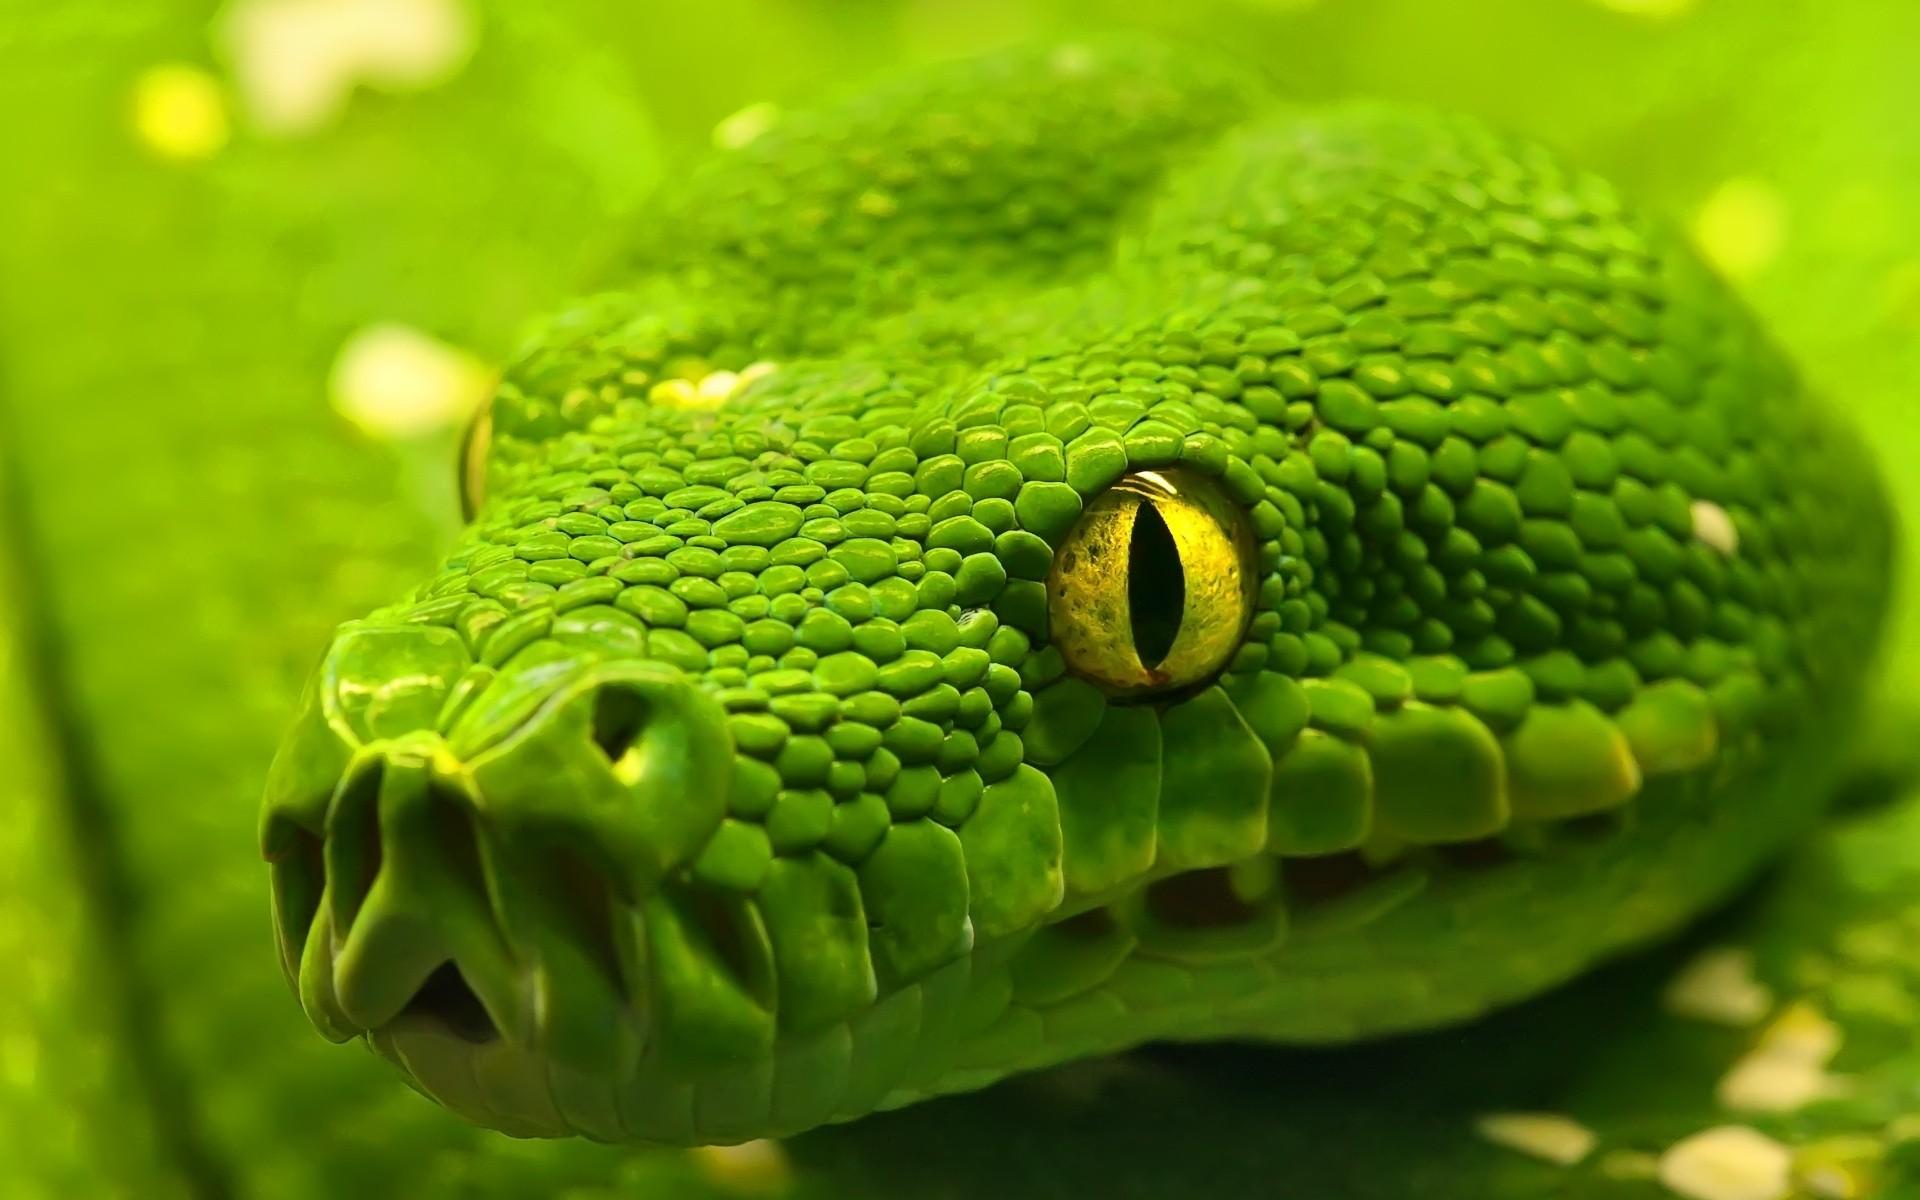 Зеленая змейка